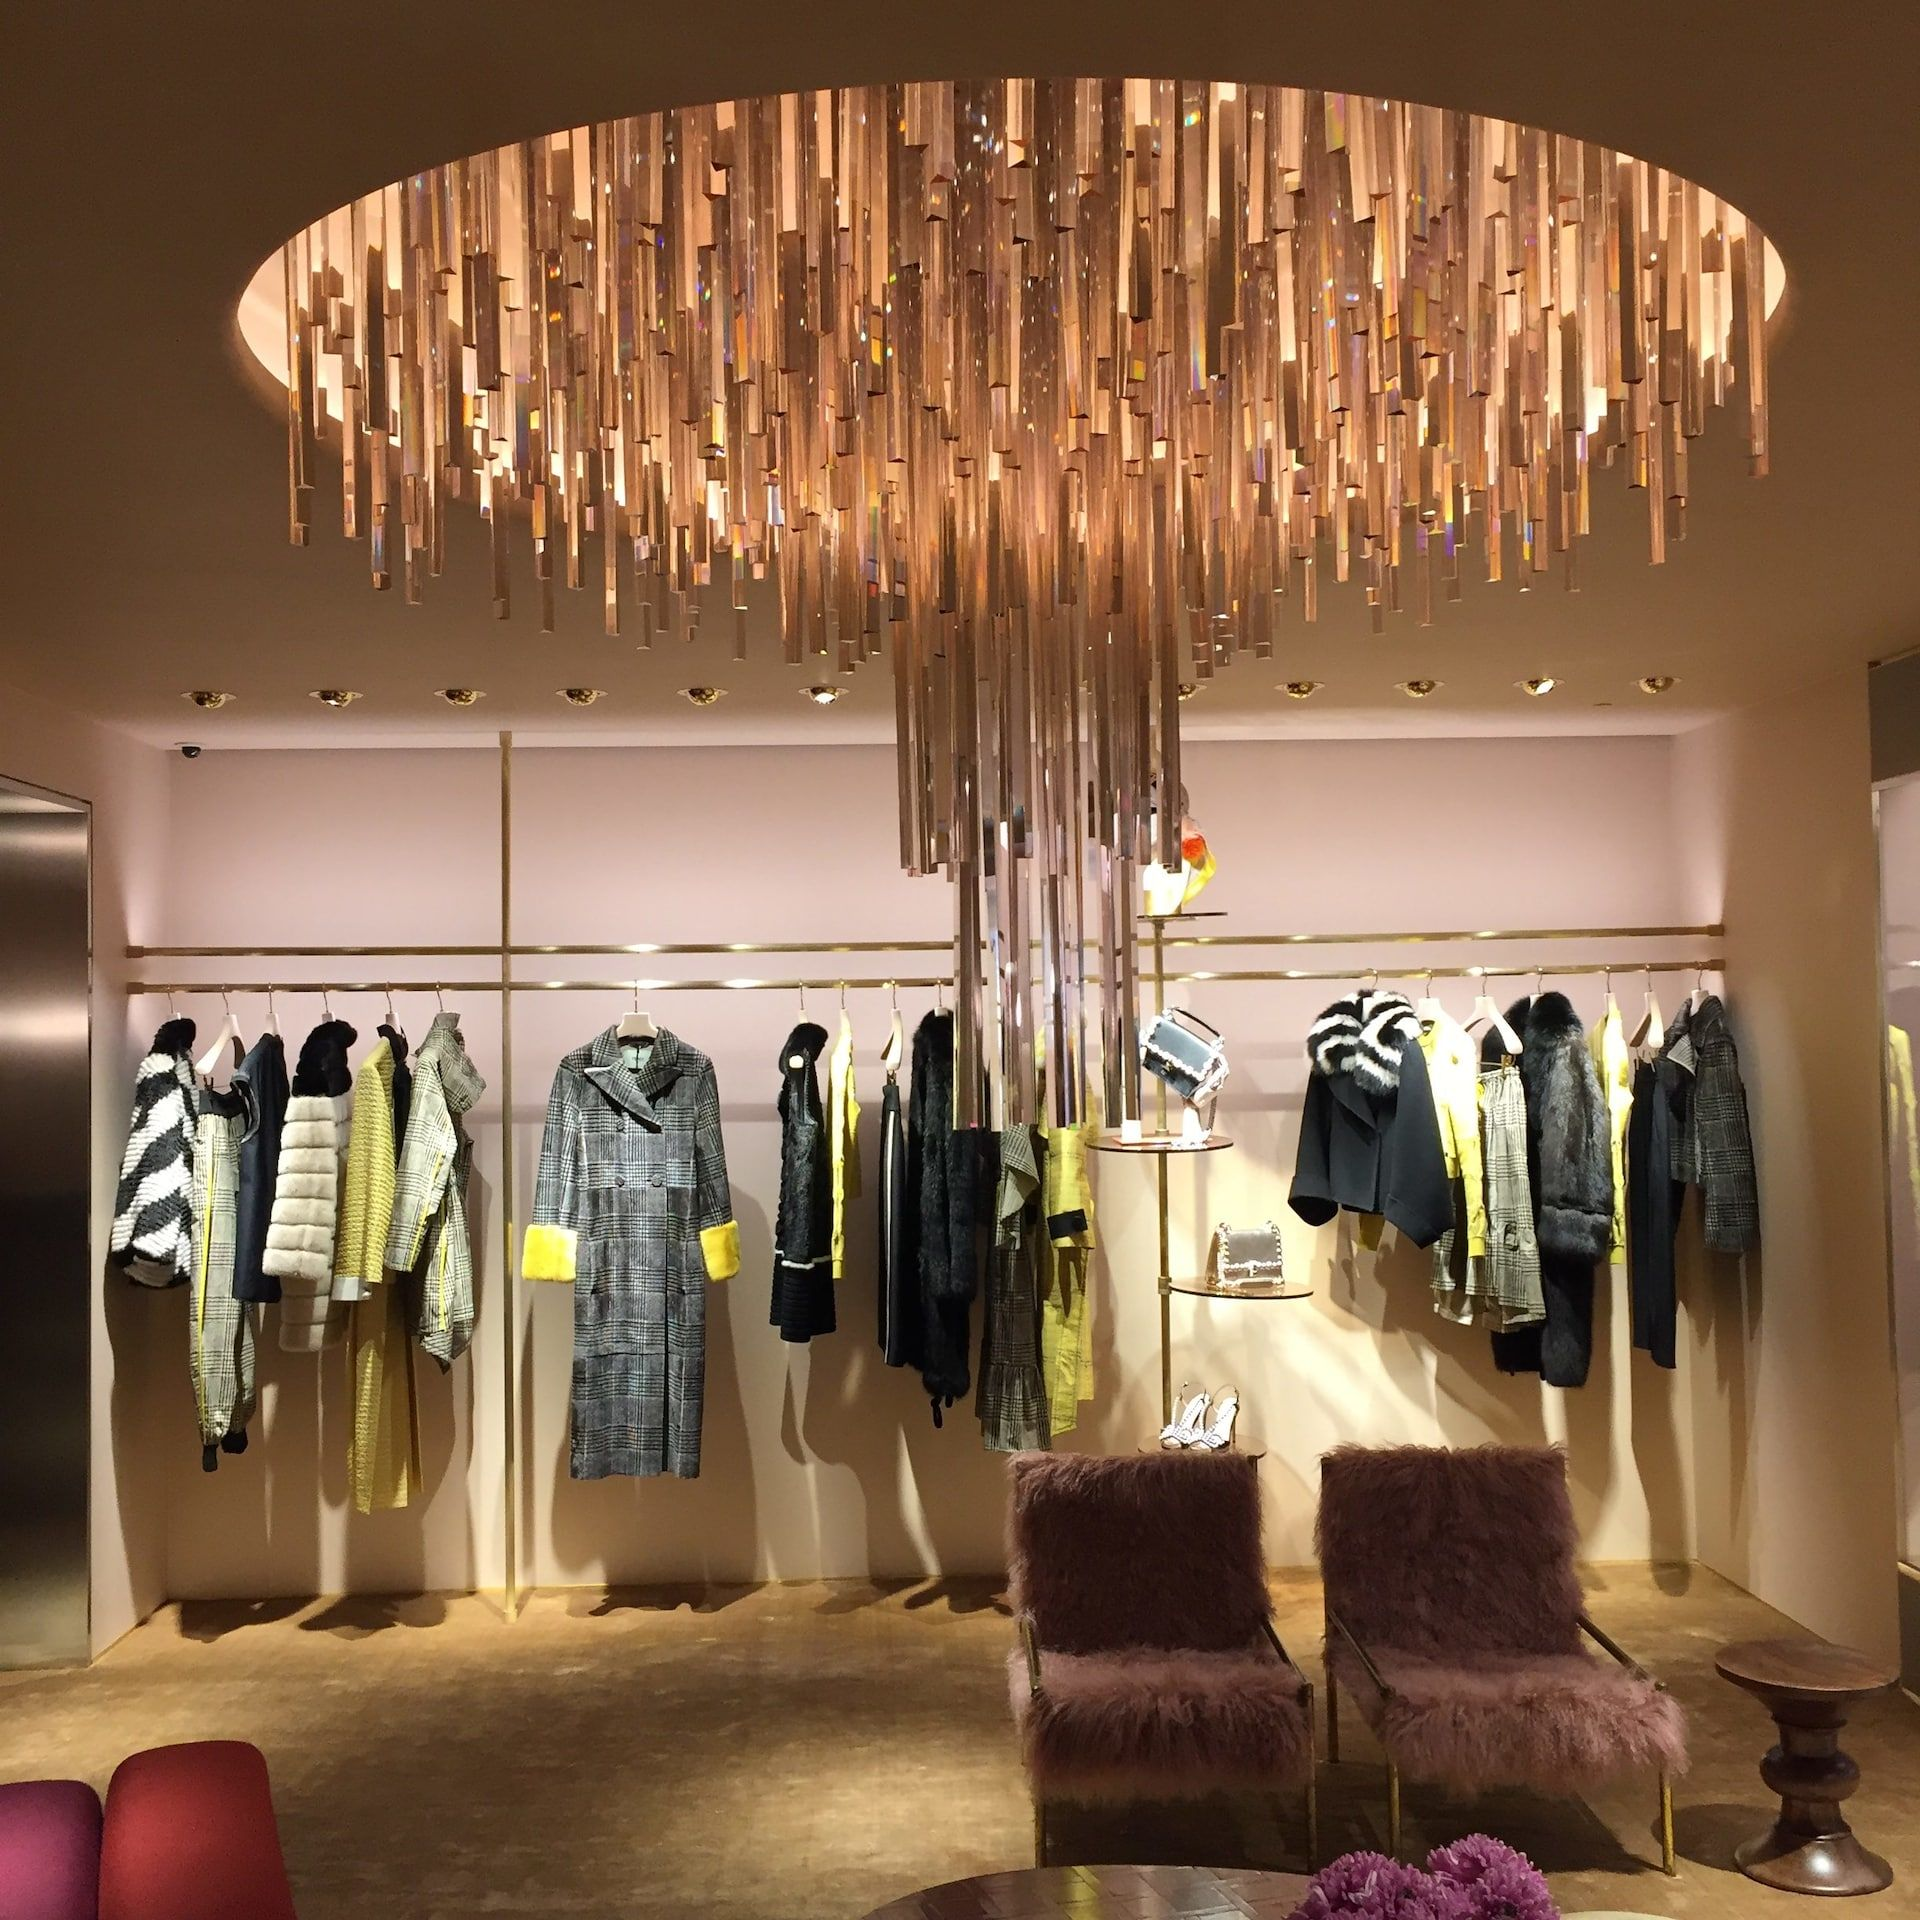 Inside Fendi's new Sloane Street boutique designed by Dimore